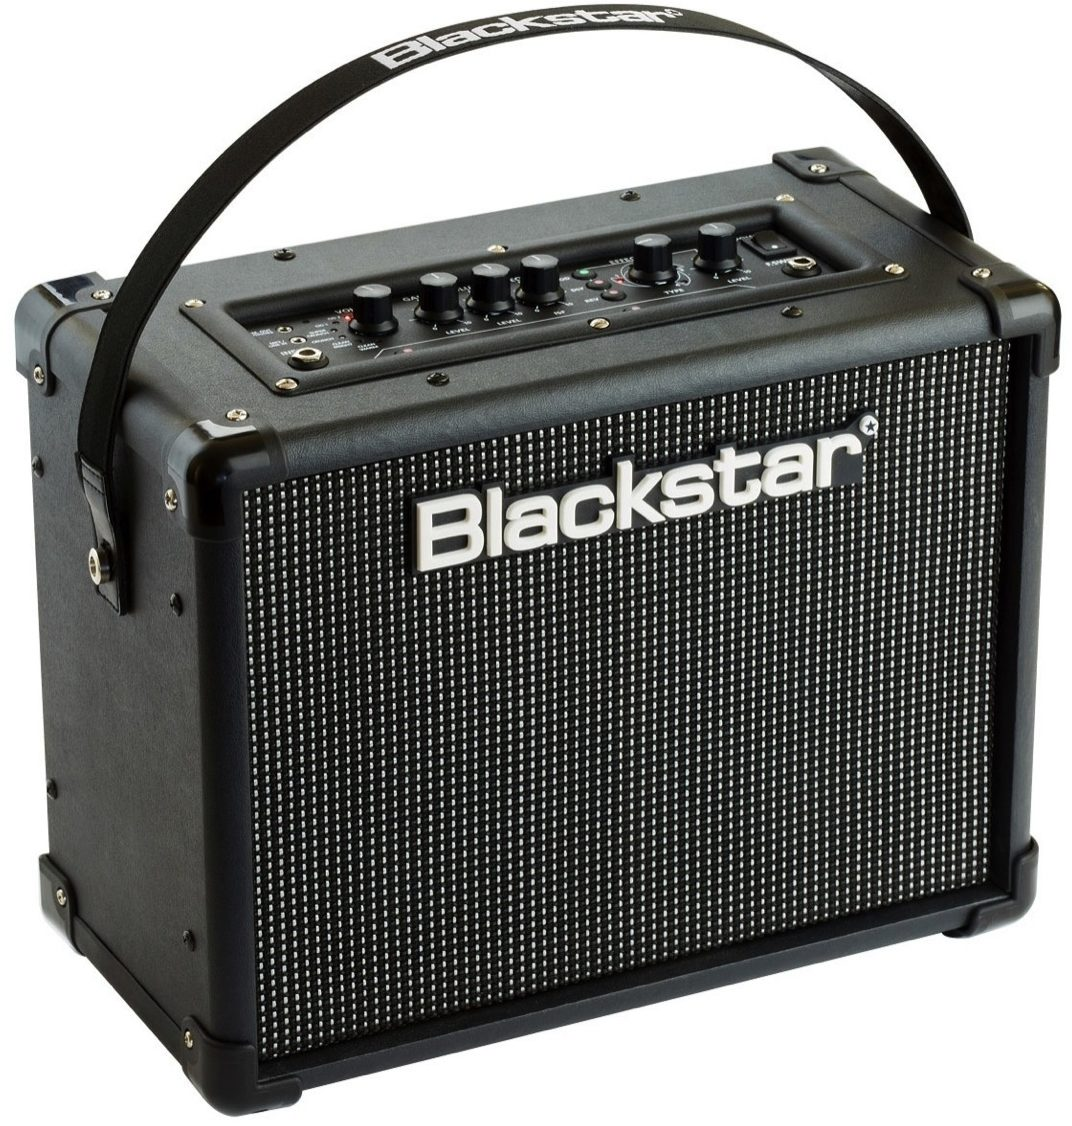 blackstar id core stereo 20 review